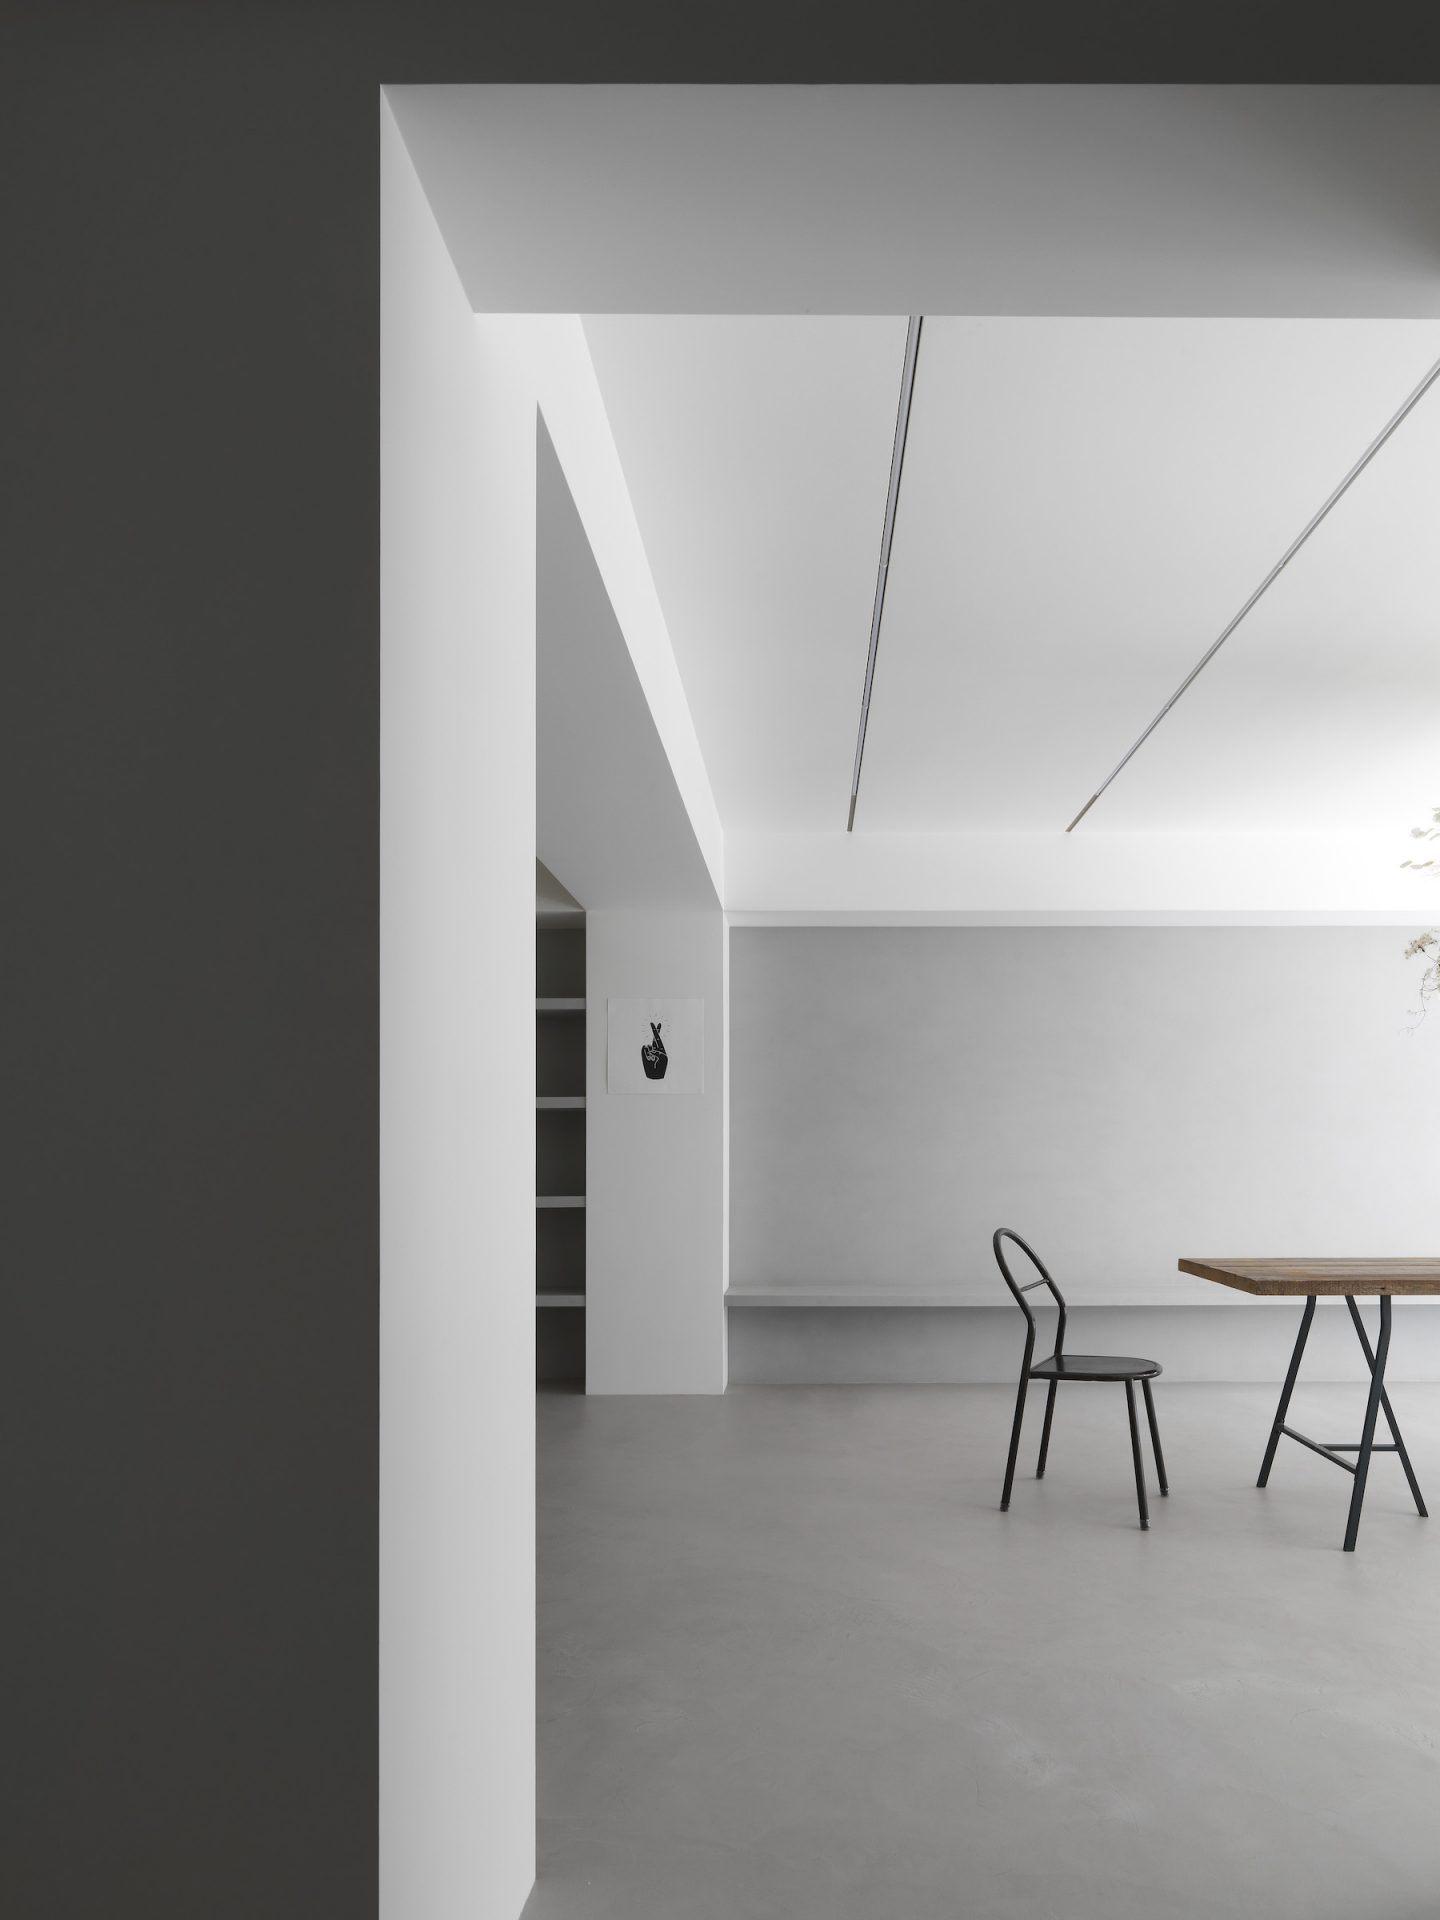 IGNANT-Design-Two-Books-Design-Changs-Apartment-17